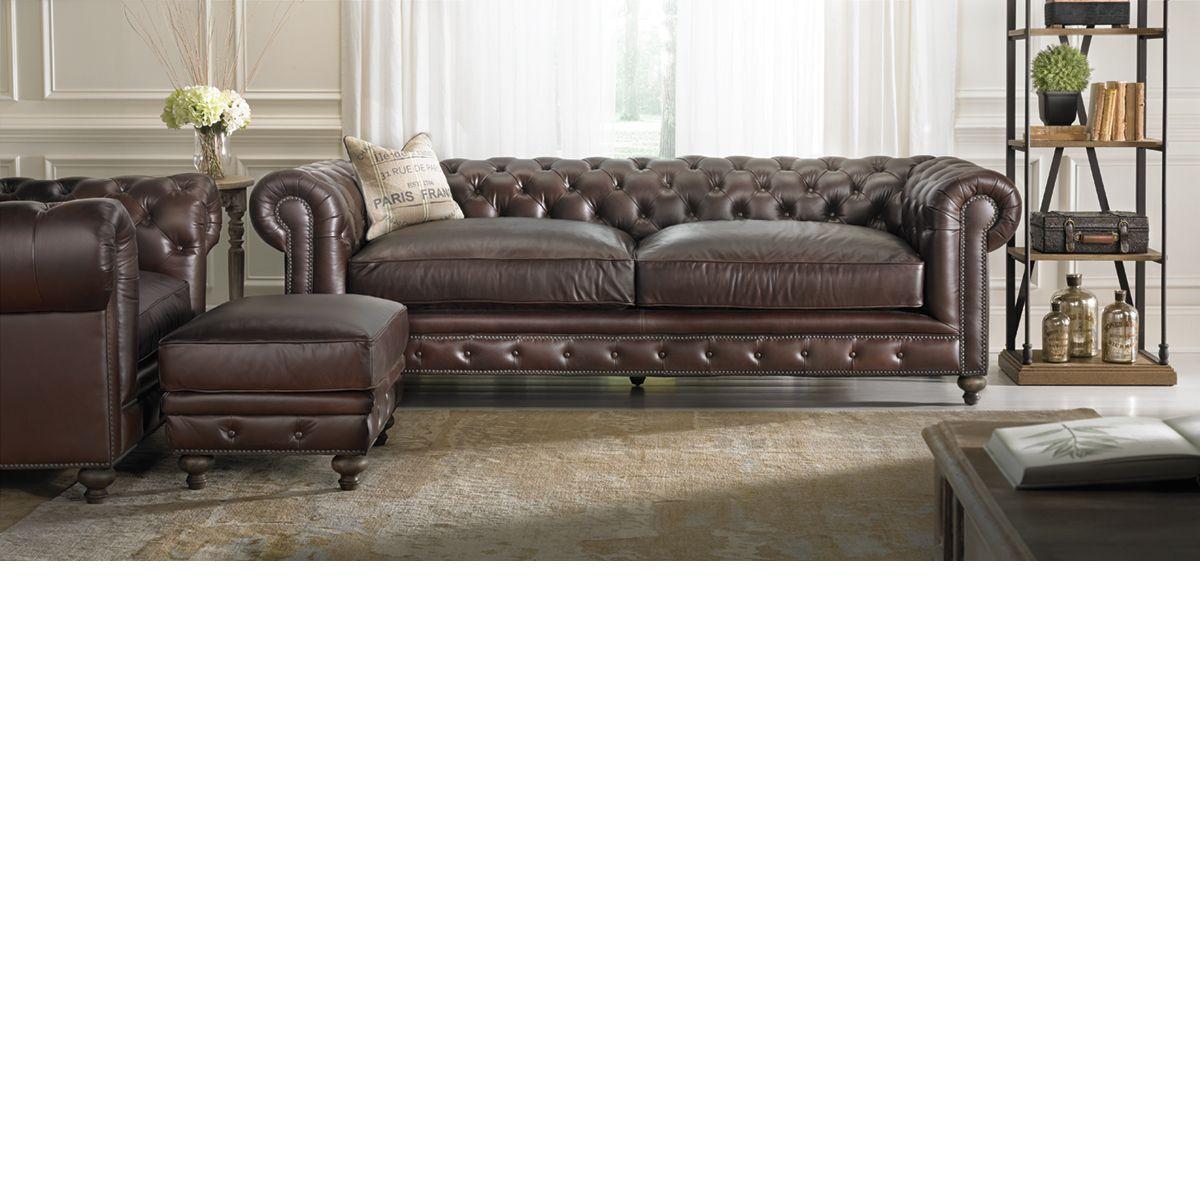 the dump sofa table vitra soft modular furniture francis drake leather things i